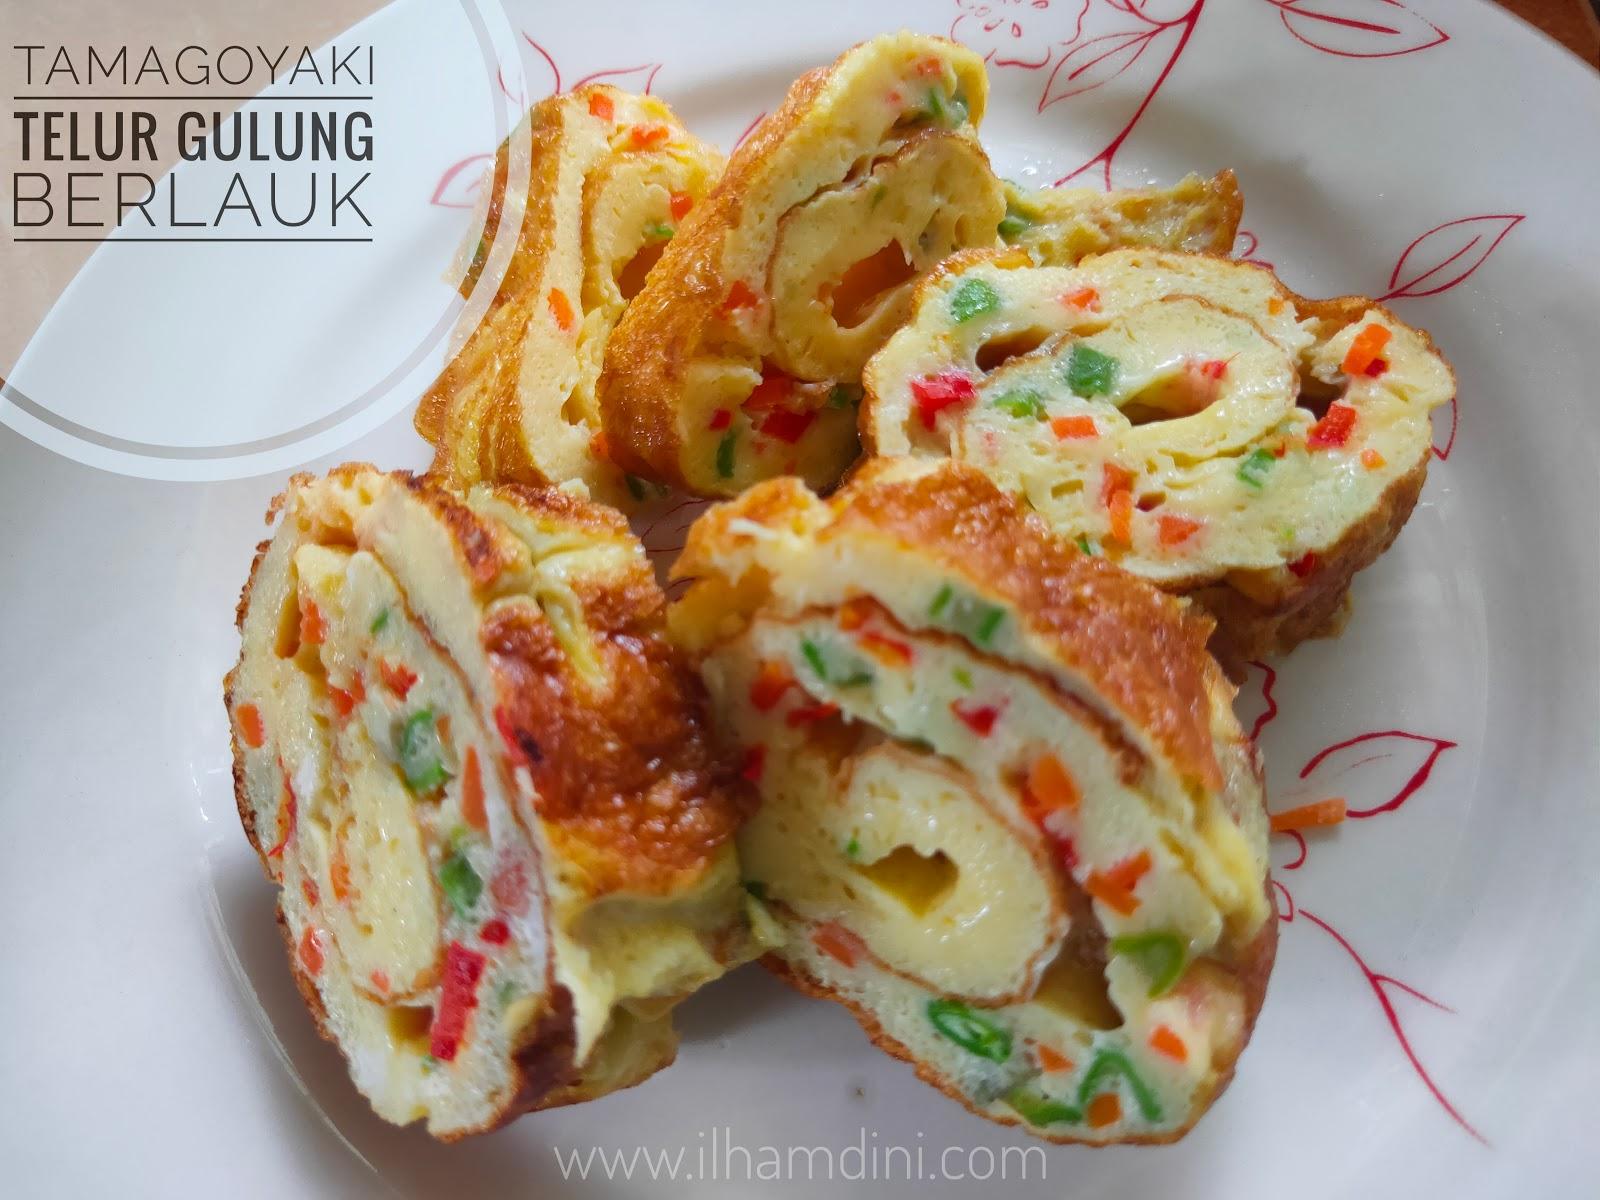 Resepi Tamagoyaki   Telur Gulung Berlauk Juadah Berbuka ...